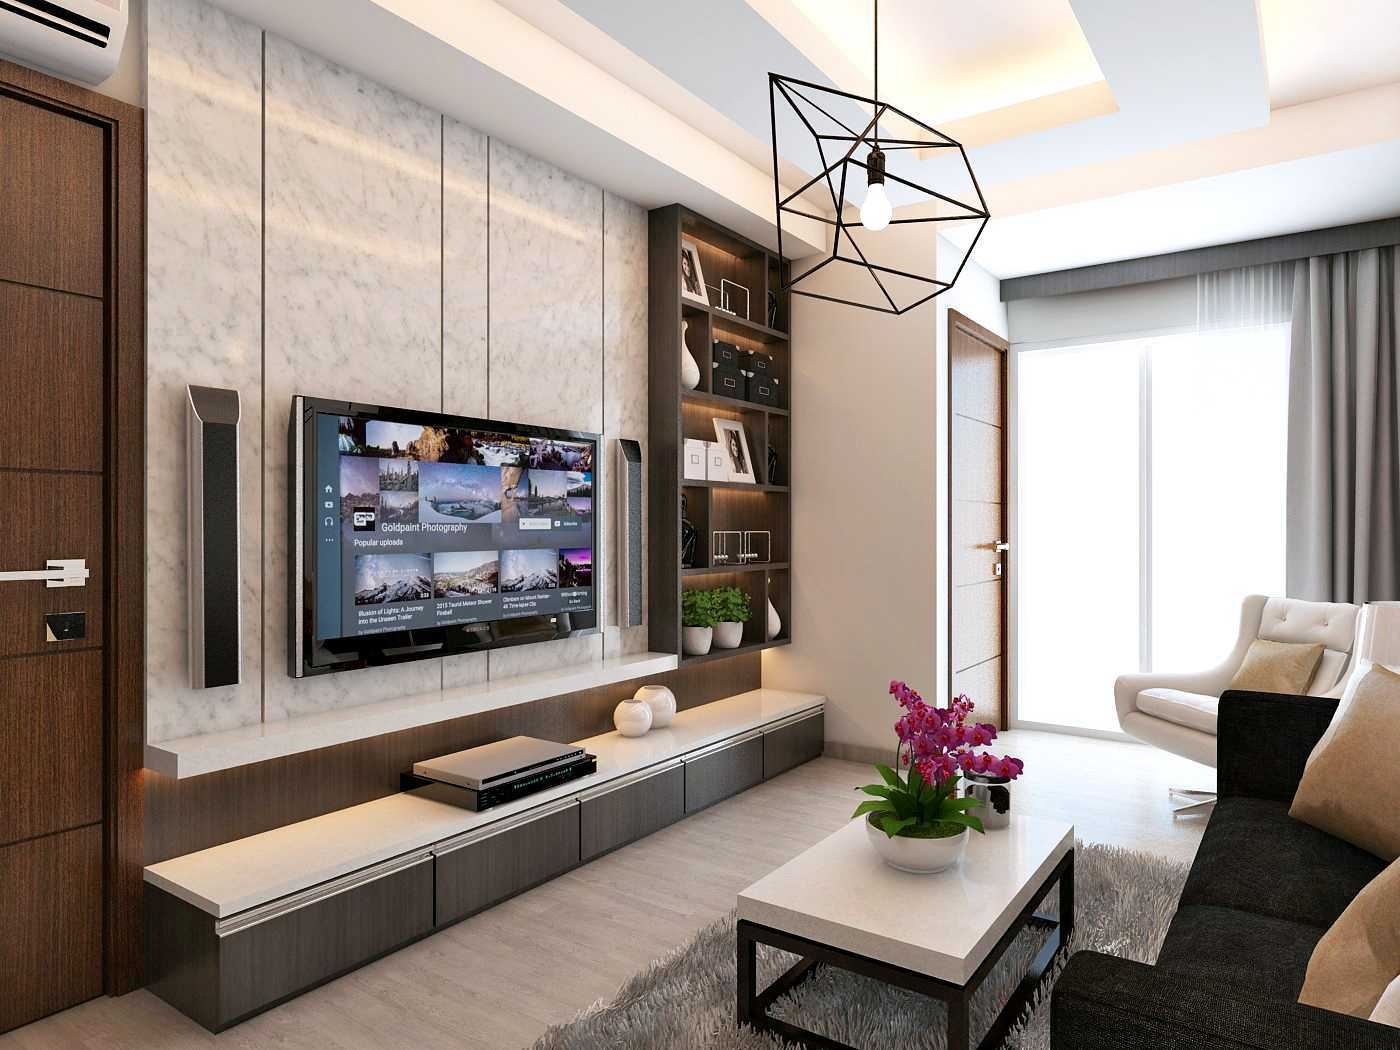 Habibullah Alfatih Condominium - Greenbay Pluit Jakarta, Indonesia Jakarta, Indonesia R-Keluarga-9 Kontemporer  35920